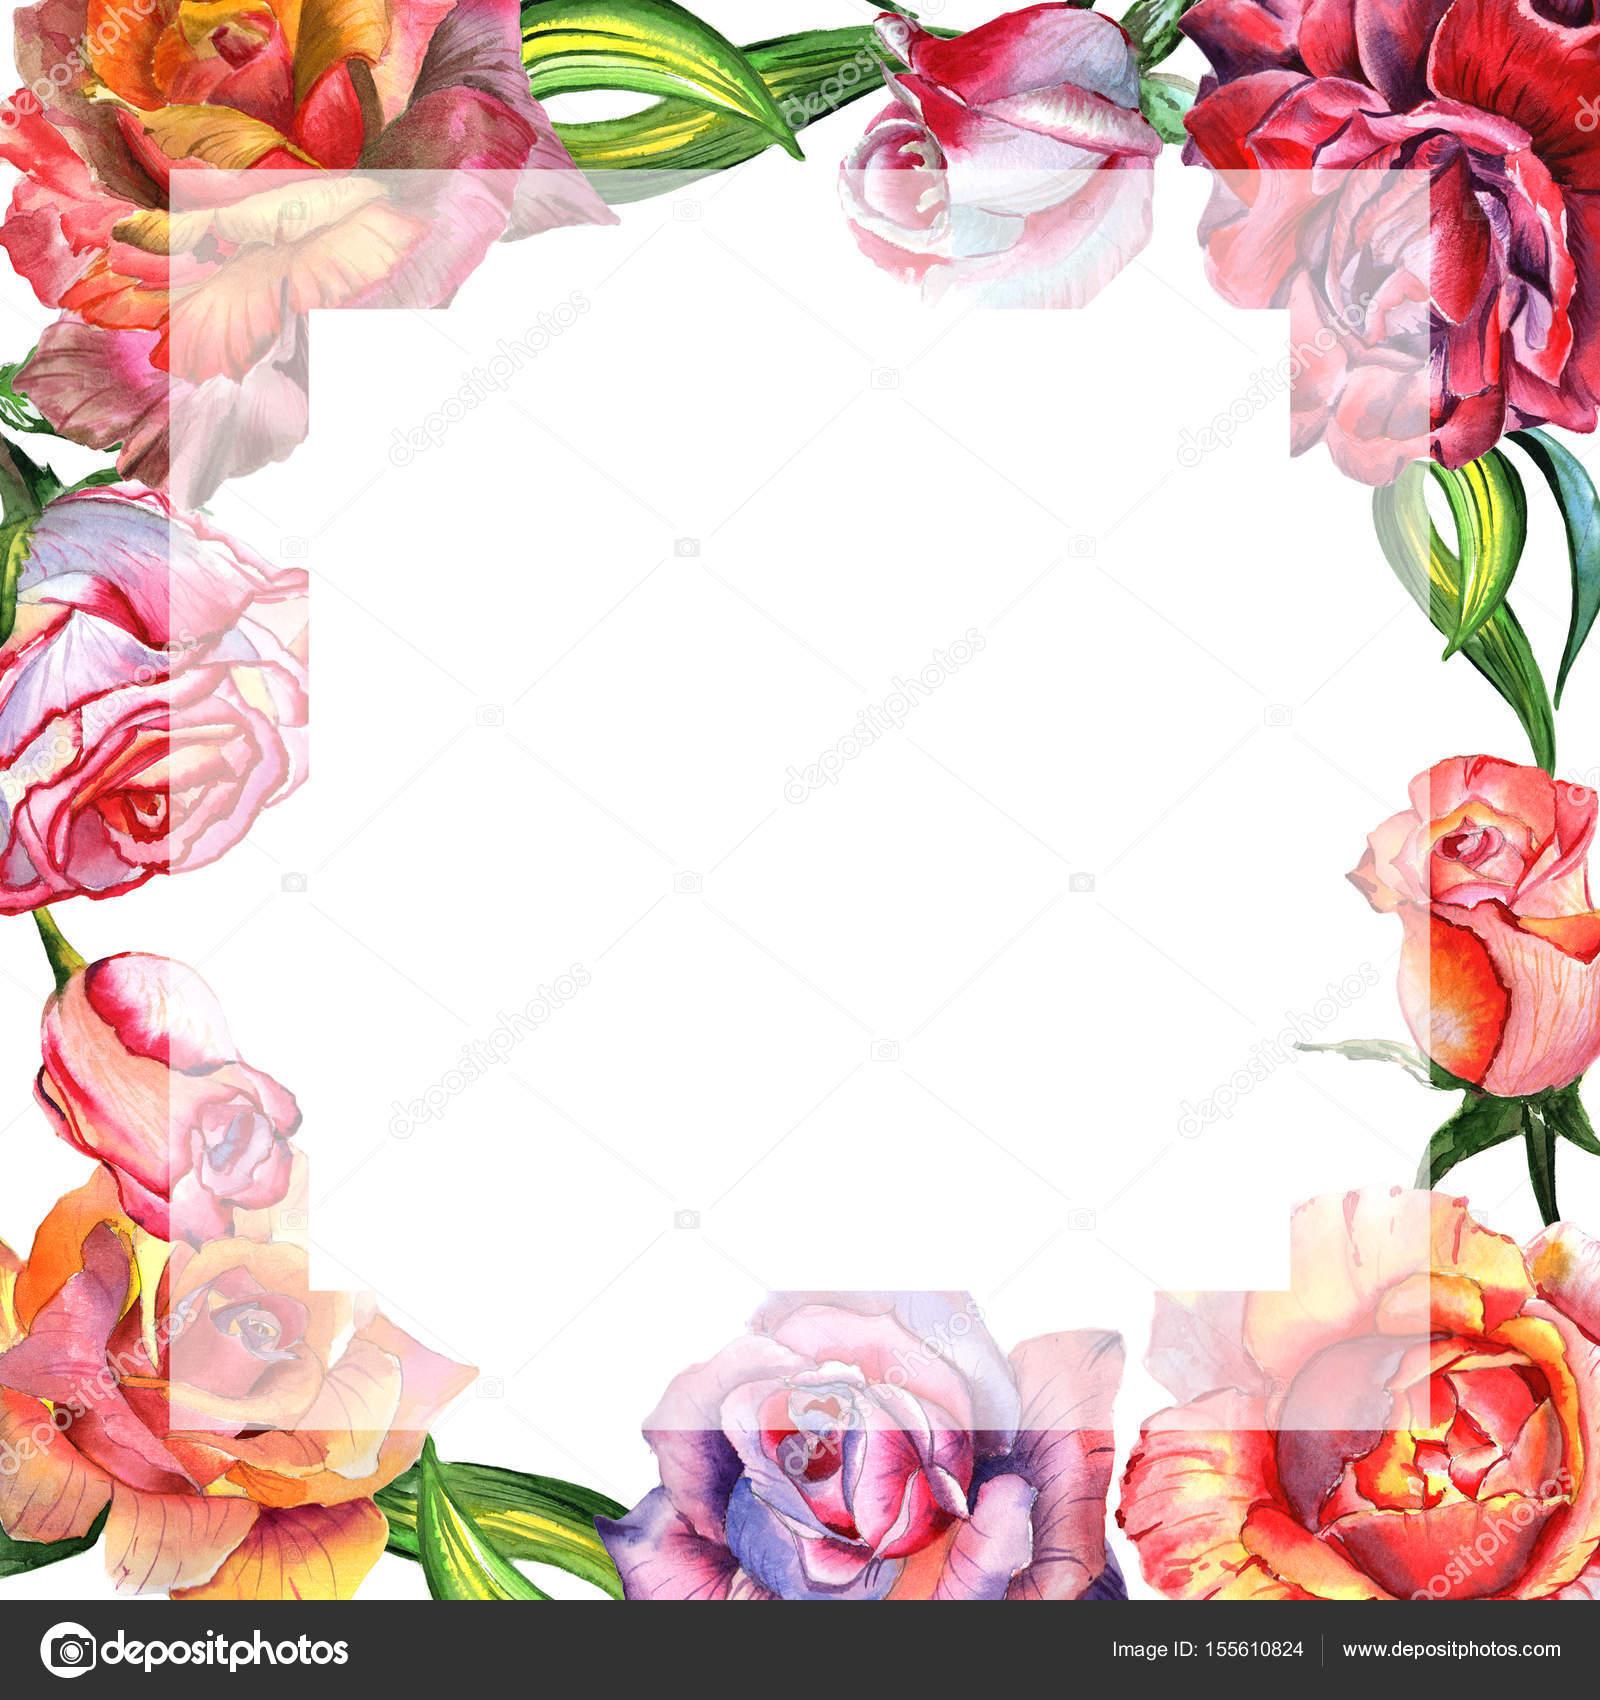 Marco de flor color de rosa de flores silvestres en un estilo ...